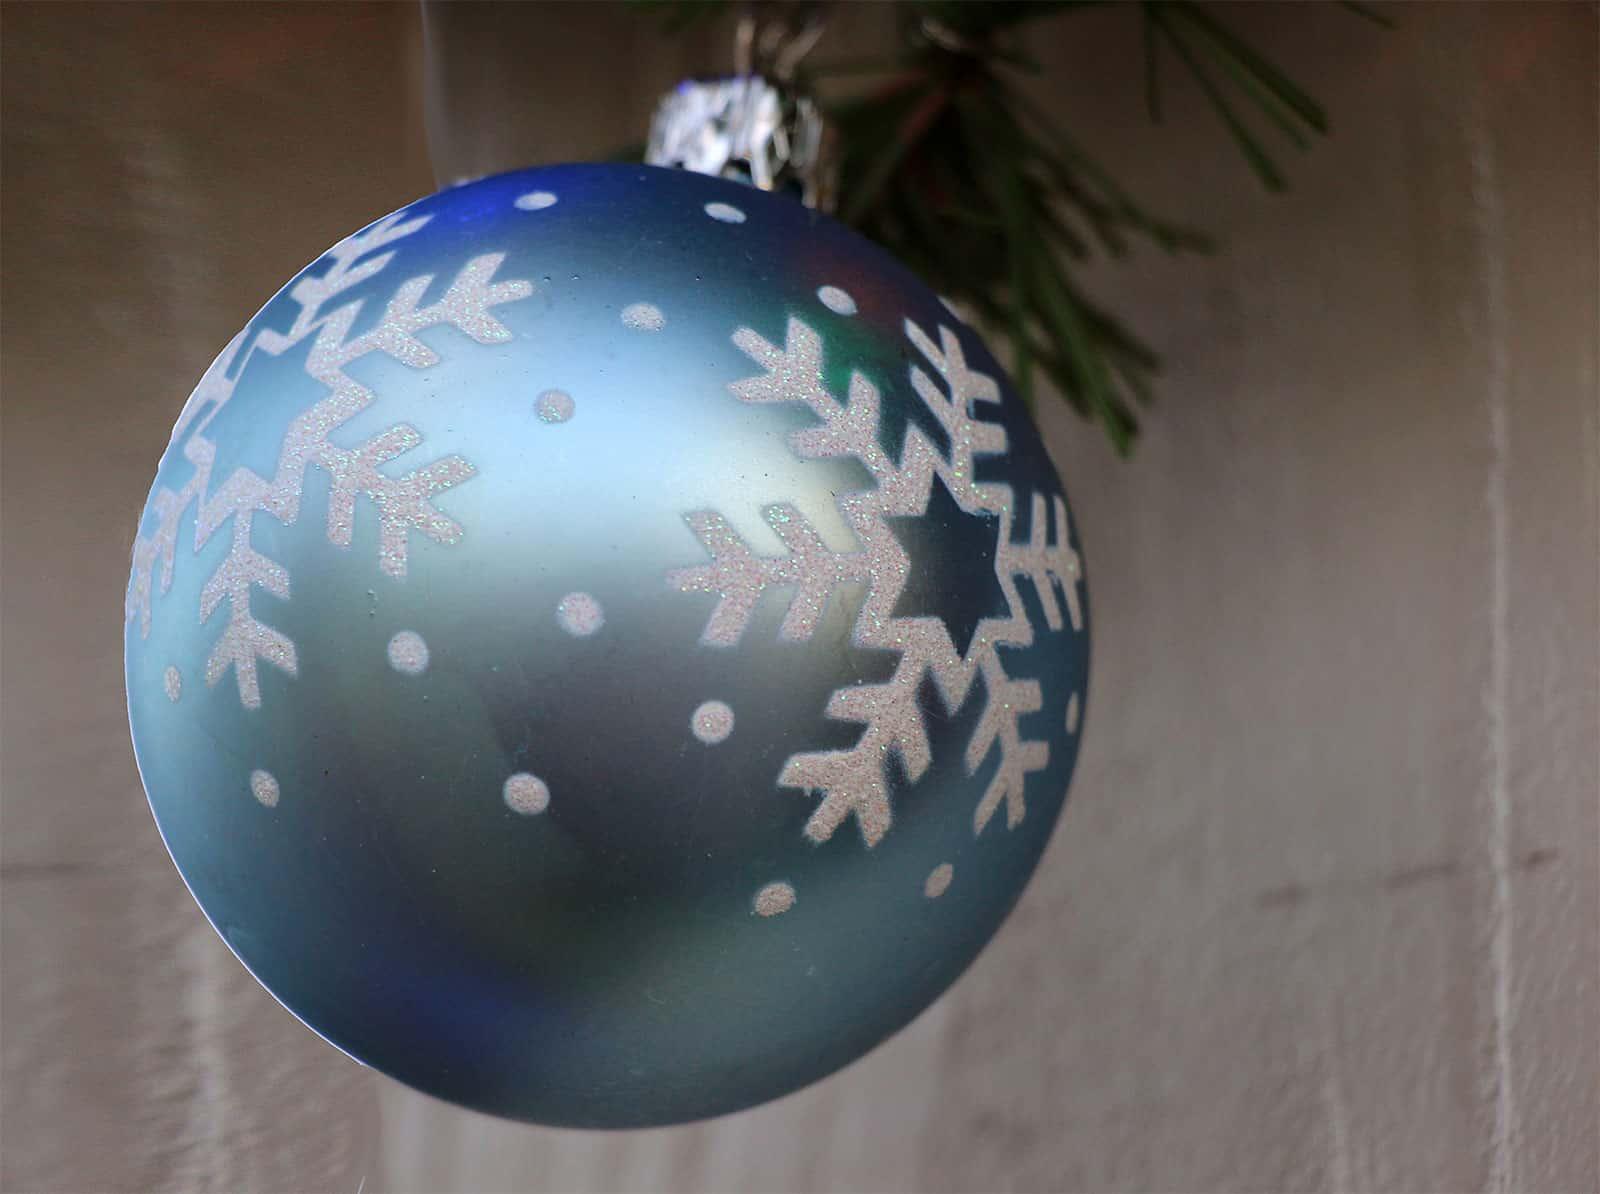 Weihnachtskugeln blau christbaumkugeln in blaut nen for Weihnachtskugeln altrosa